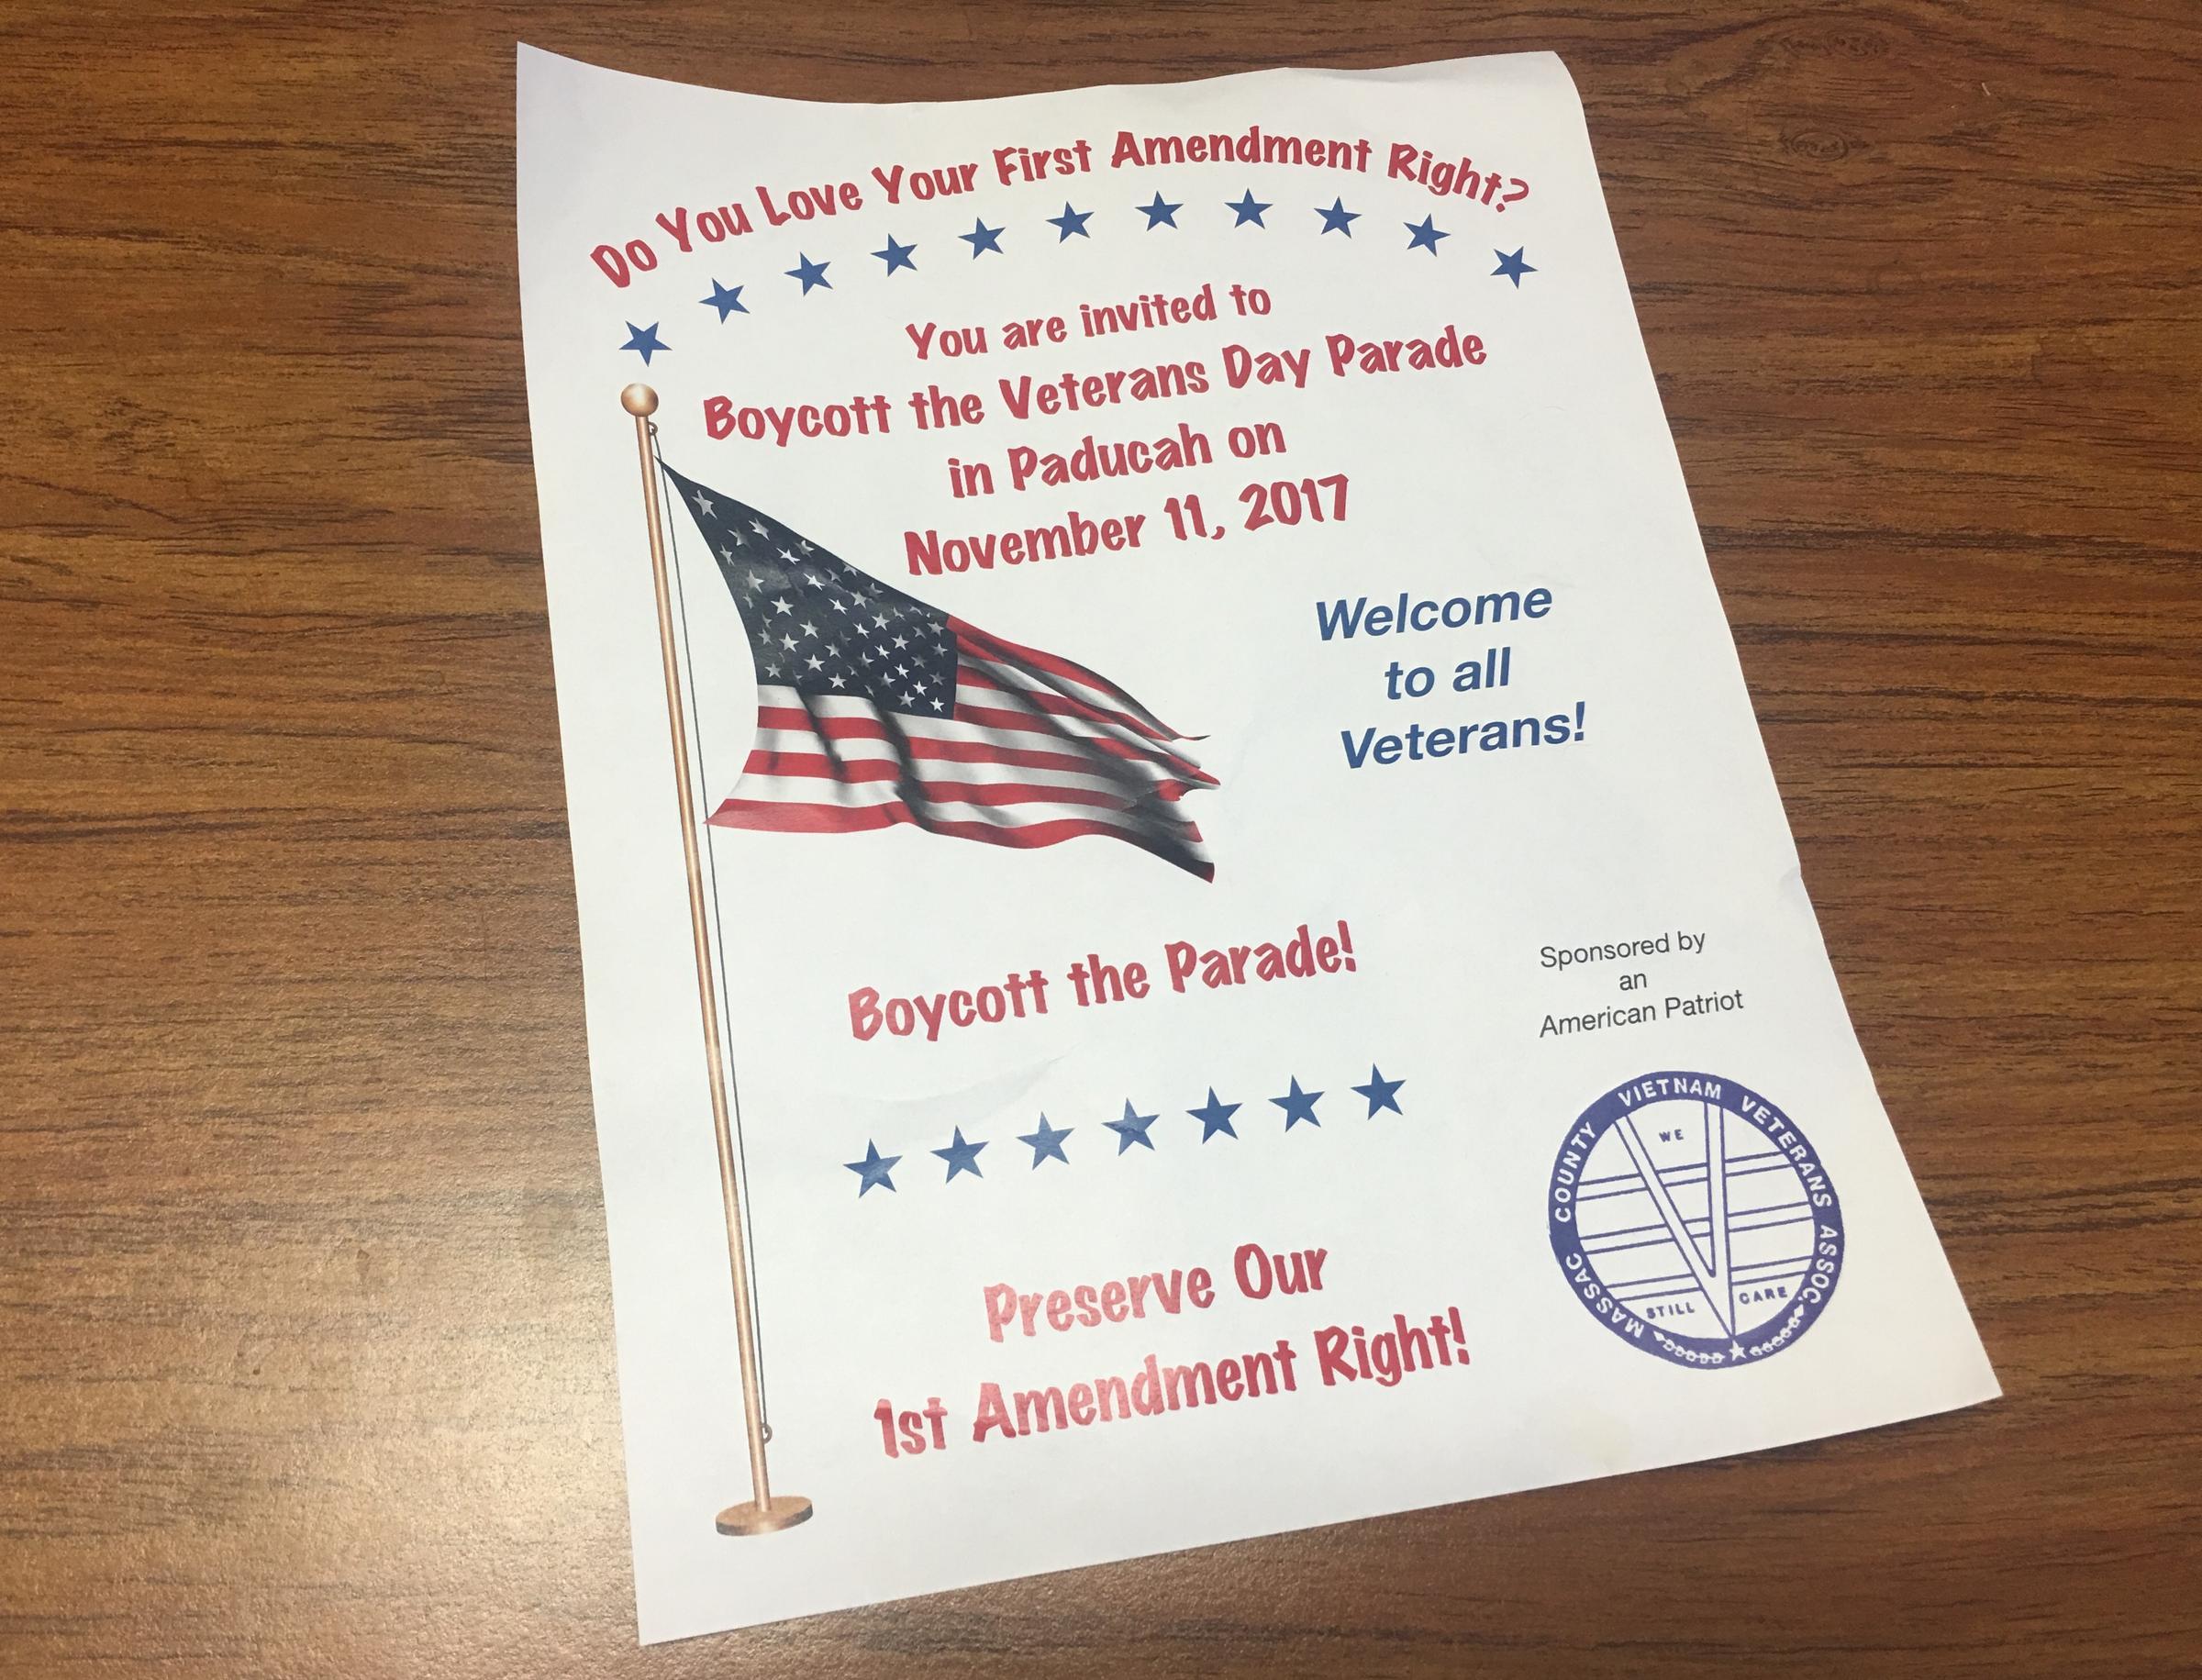 Veterans In Paducah Protest Citys Confederate Flag Parade Ban Call